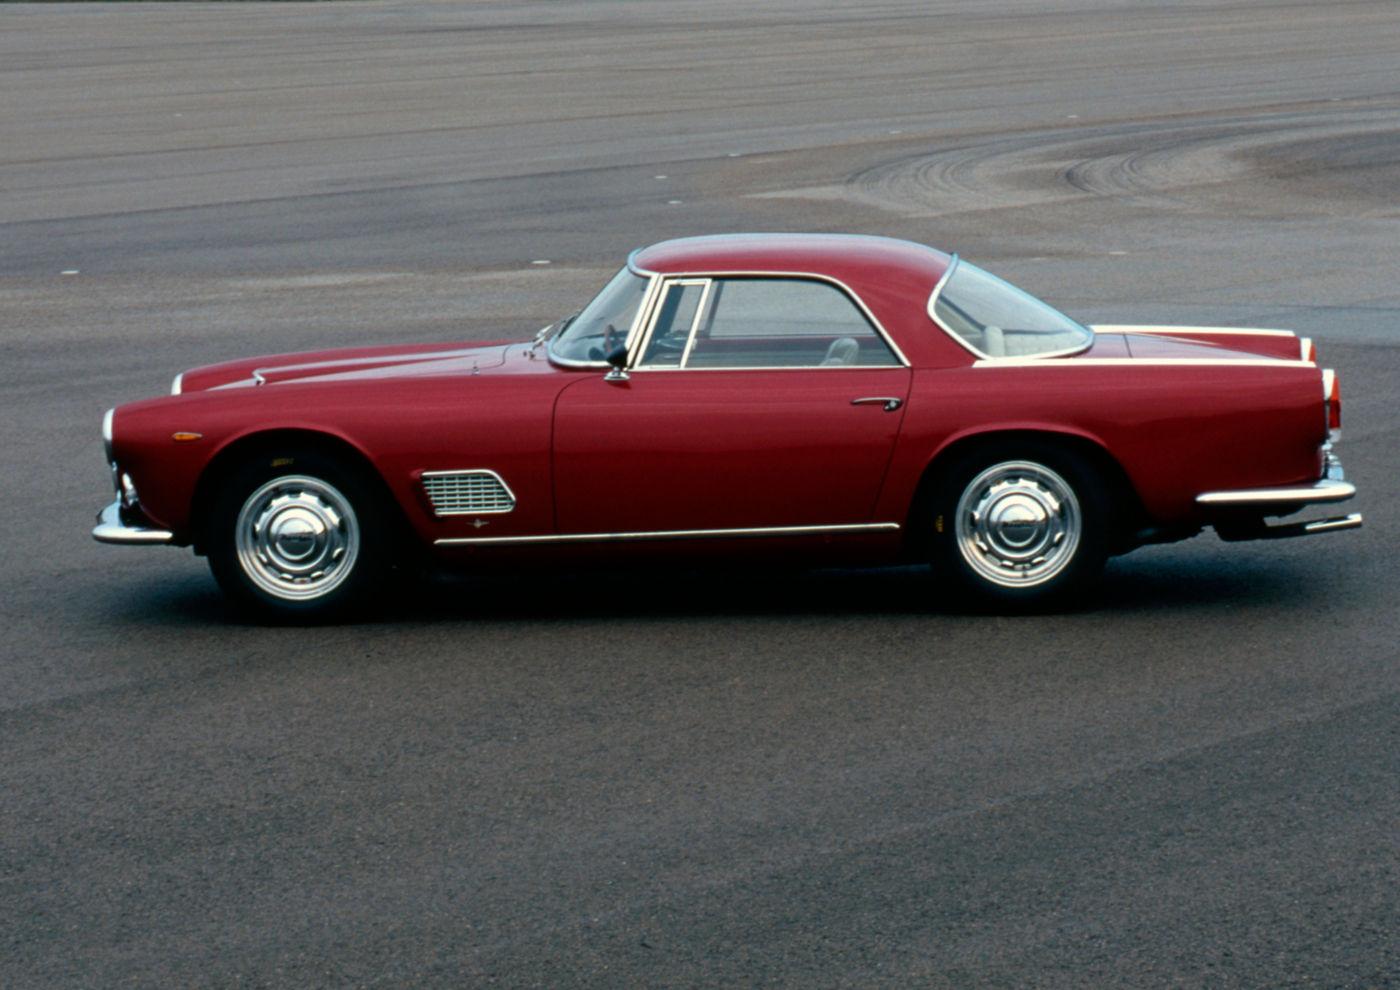 Maserati Classic - GranTurismo 3500GTI - carrosserie rouge - vue profil